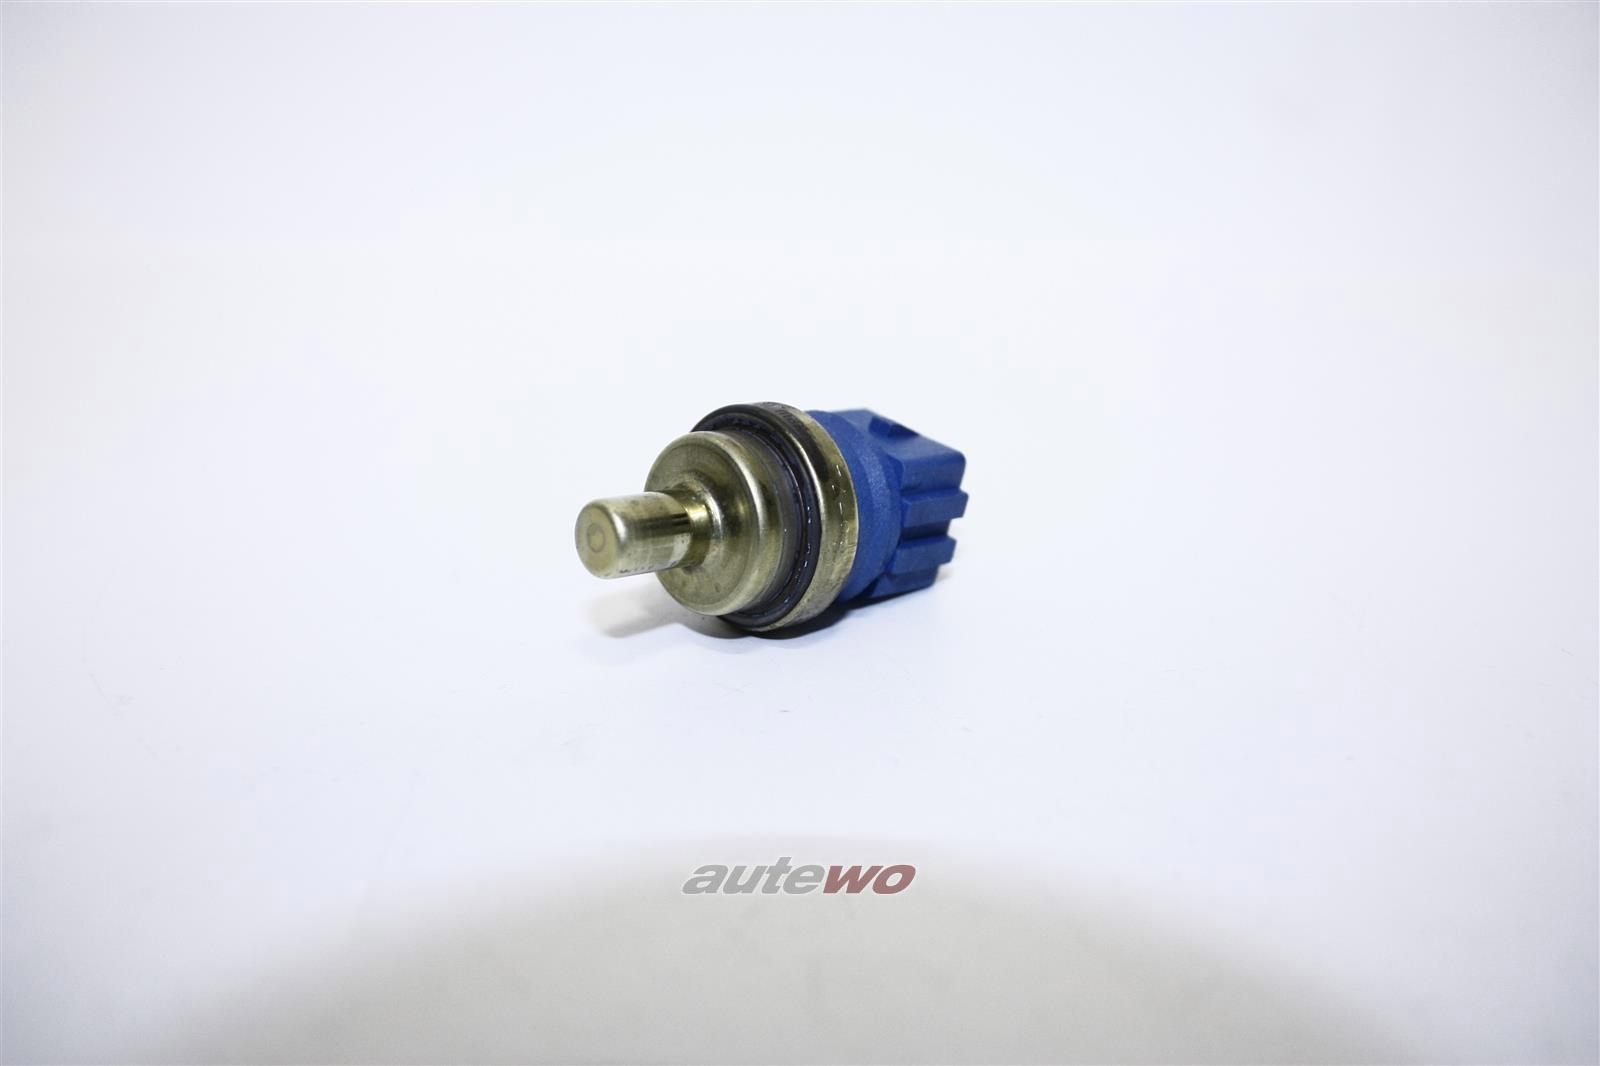 059919501 078919501B NEU Audi A3 8L/A4 B5/A6 4B/A8 D2 Kühlwassertemperaturgeber